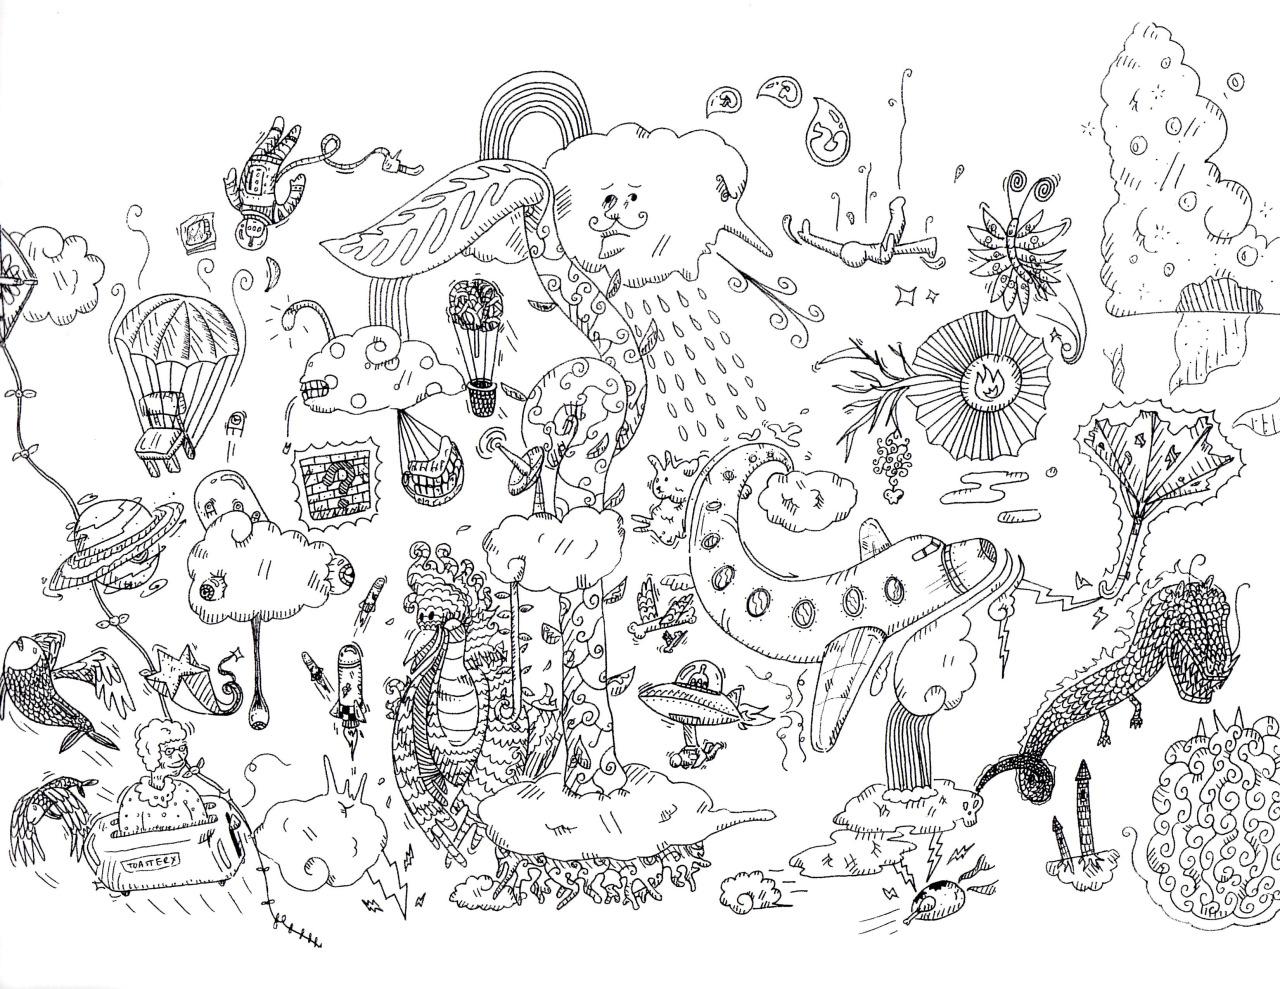 Doodles 2.jpg